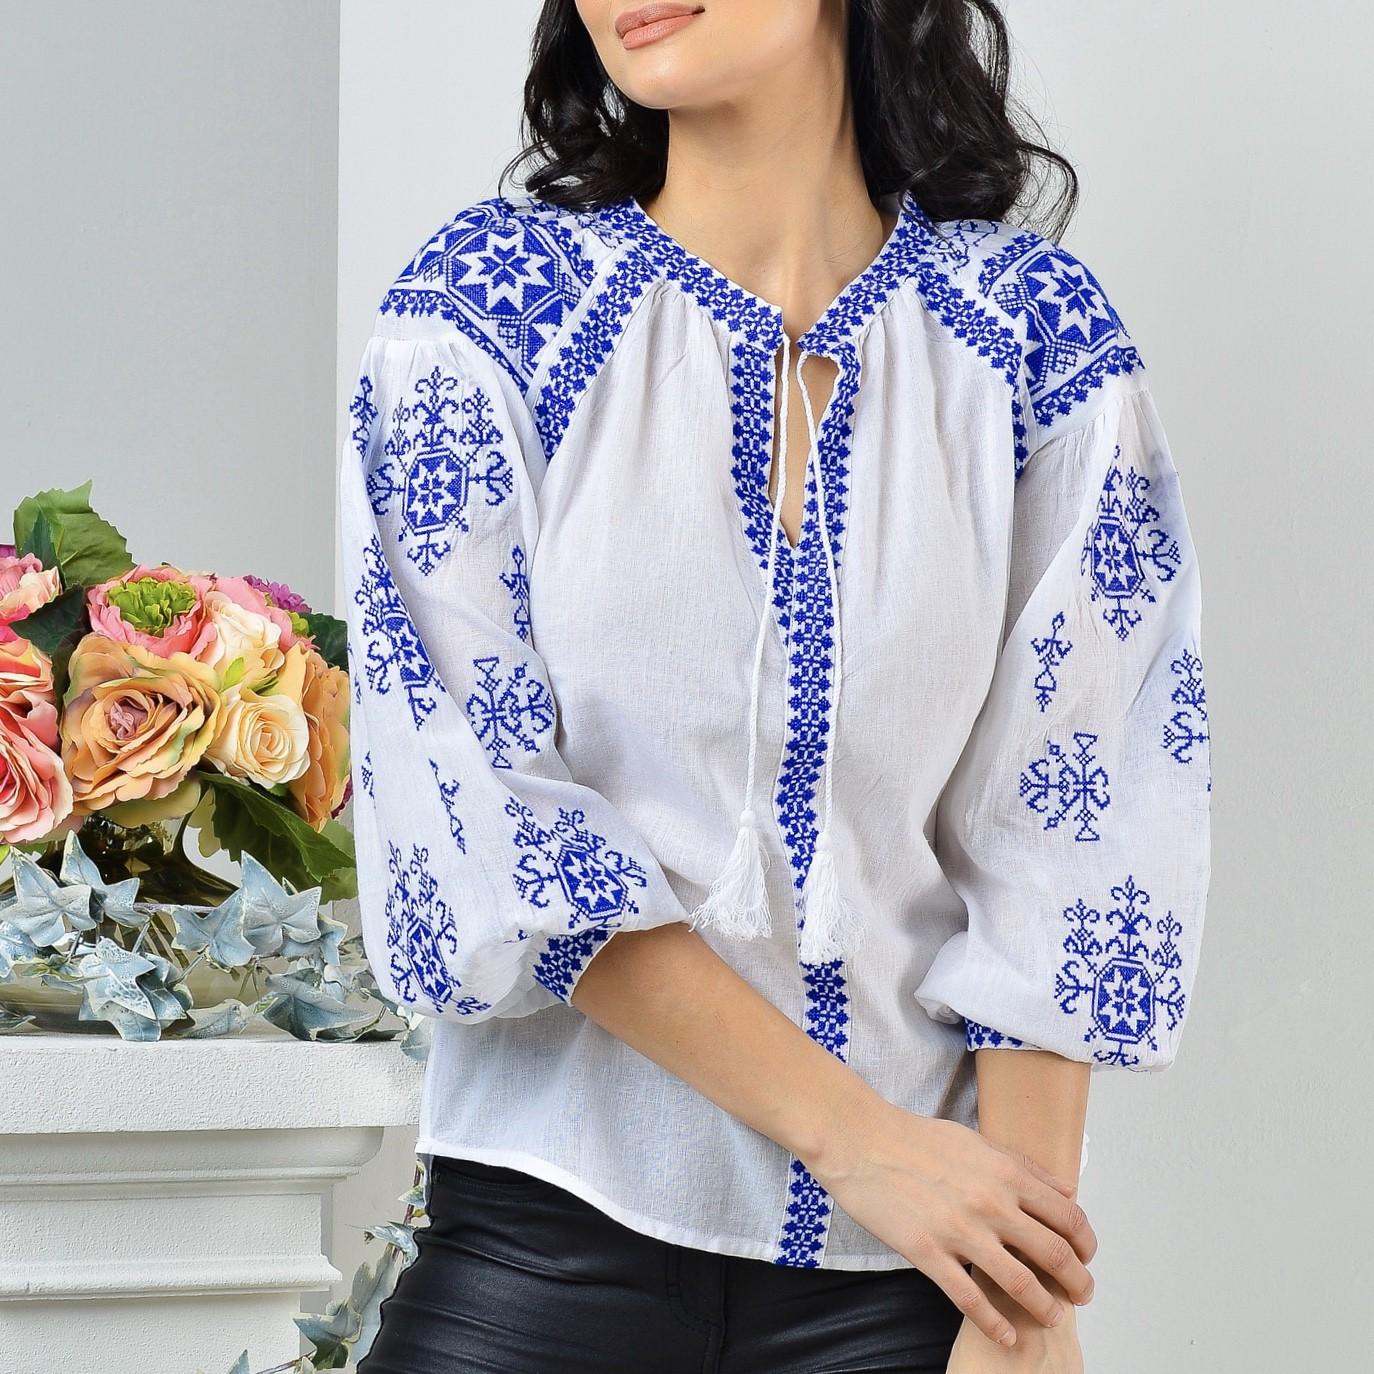 Reducere Bluza Traditionala brodata Ilinca | Goosales.ro